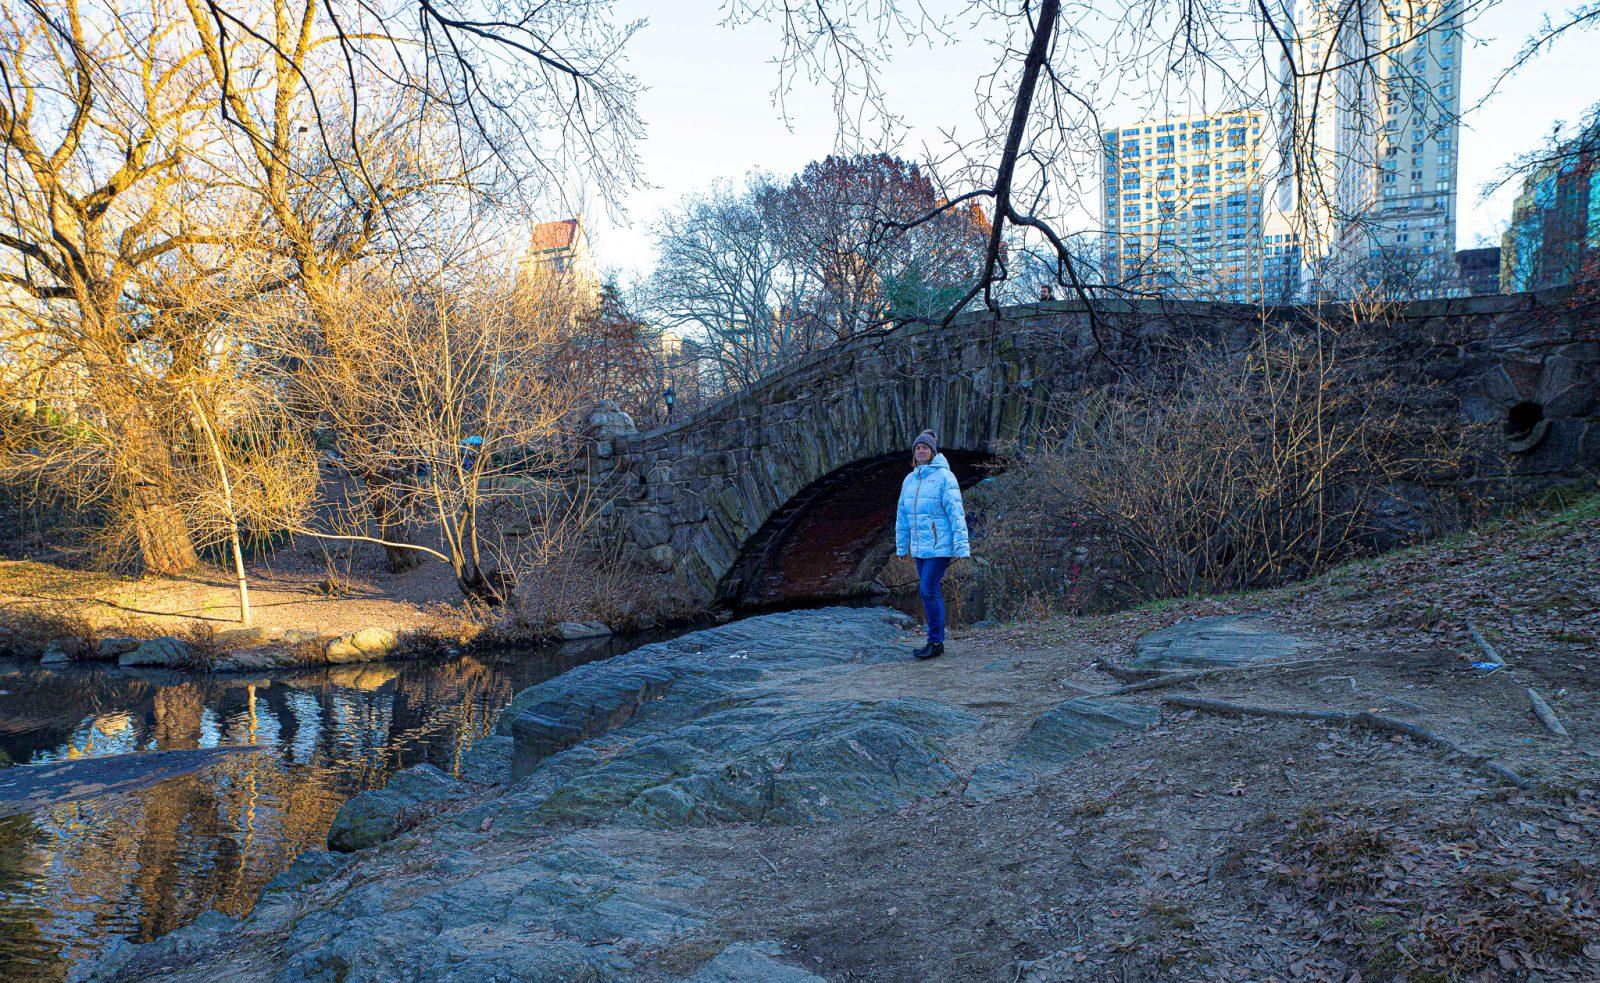 broen i central park der ugledamen turtelduene i alene hjemme filmen matet duene